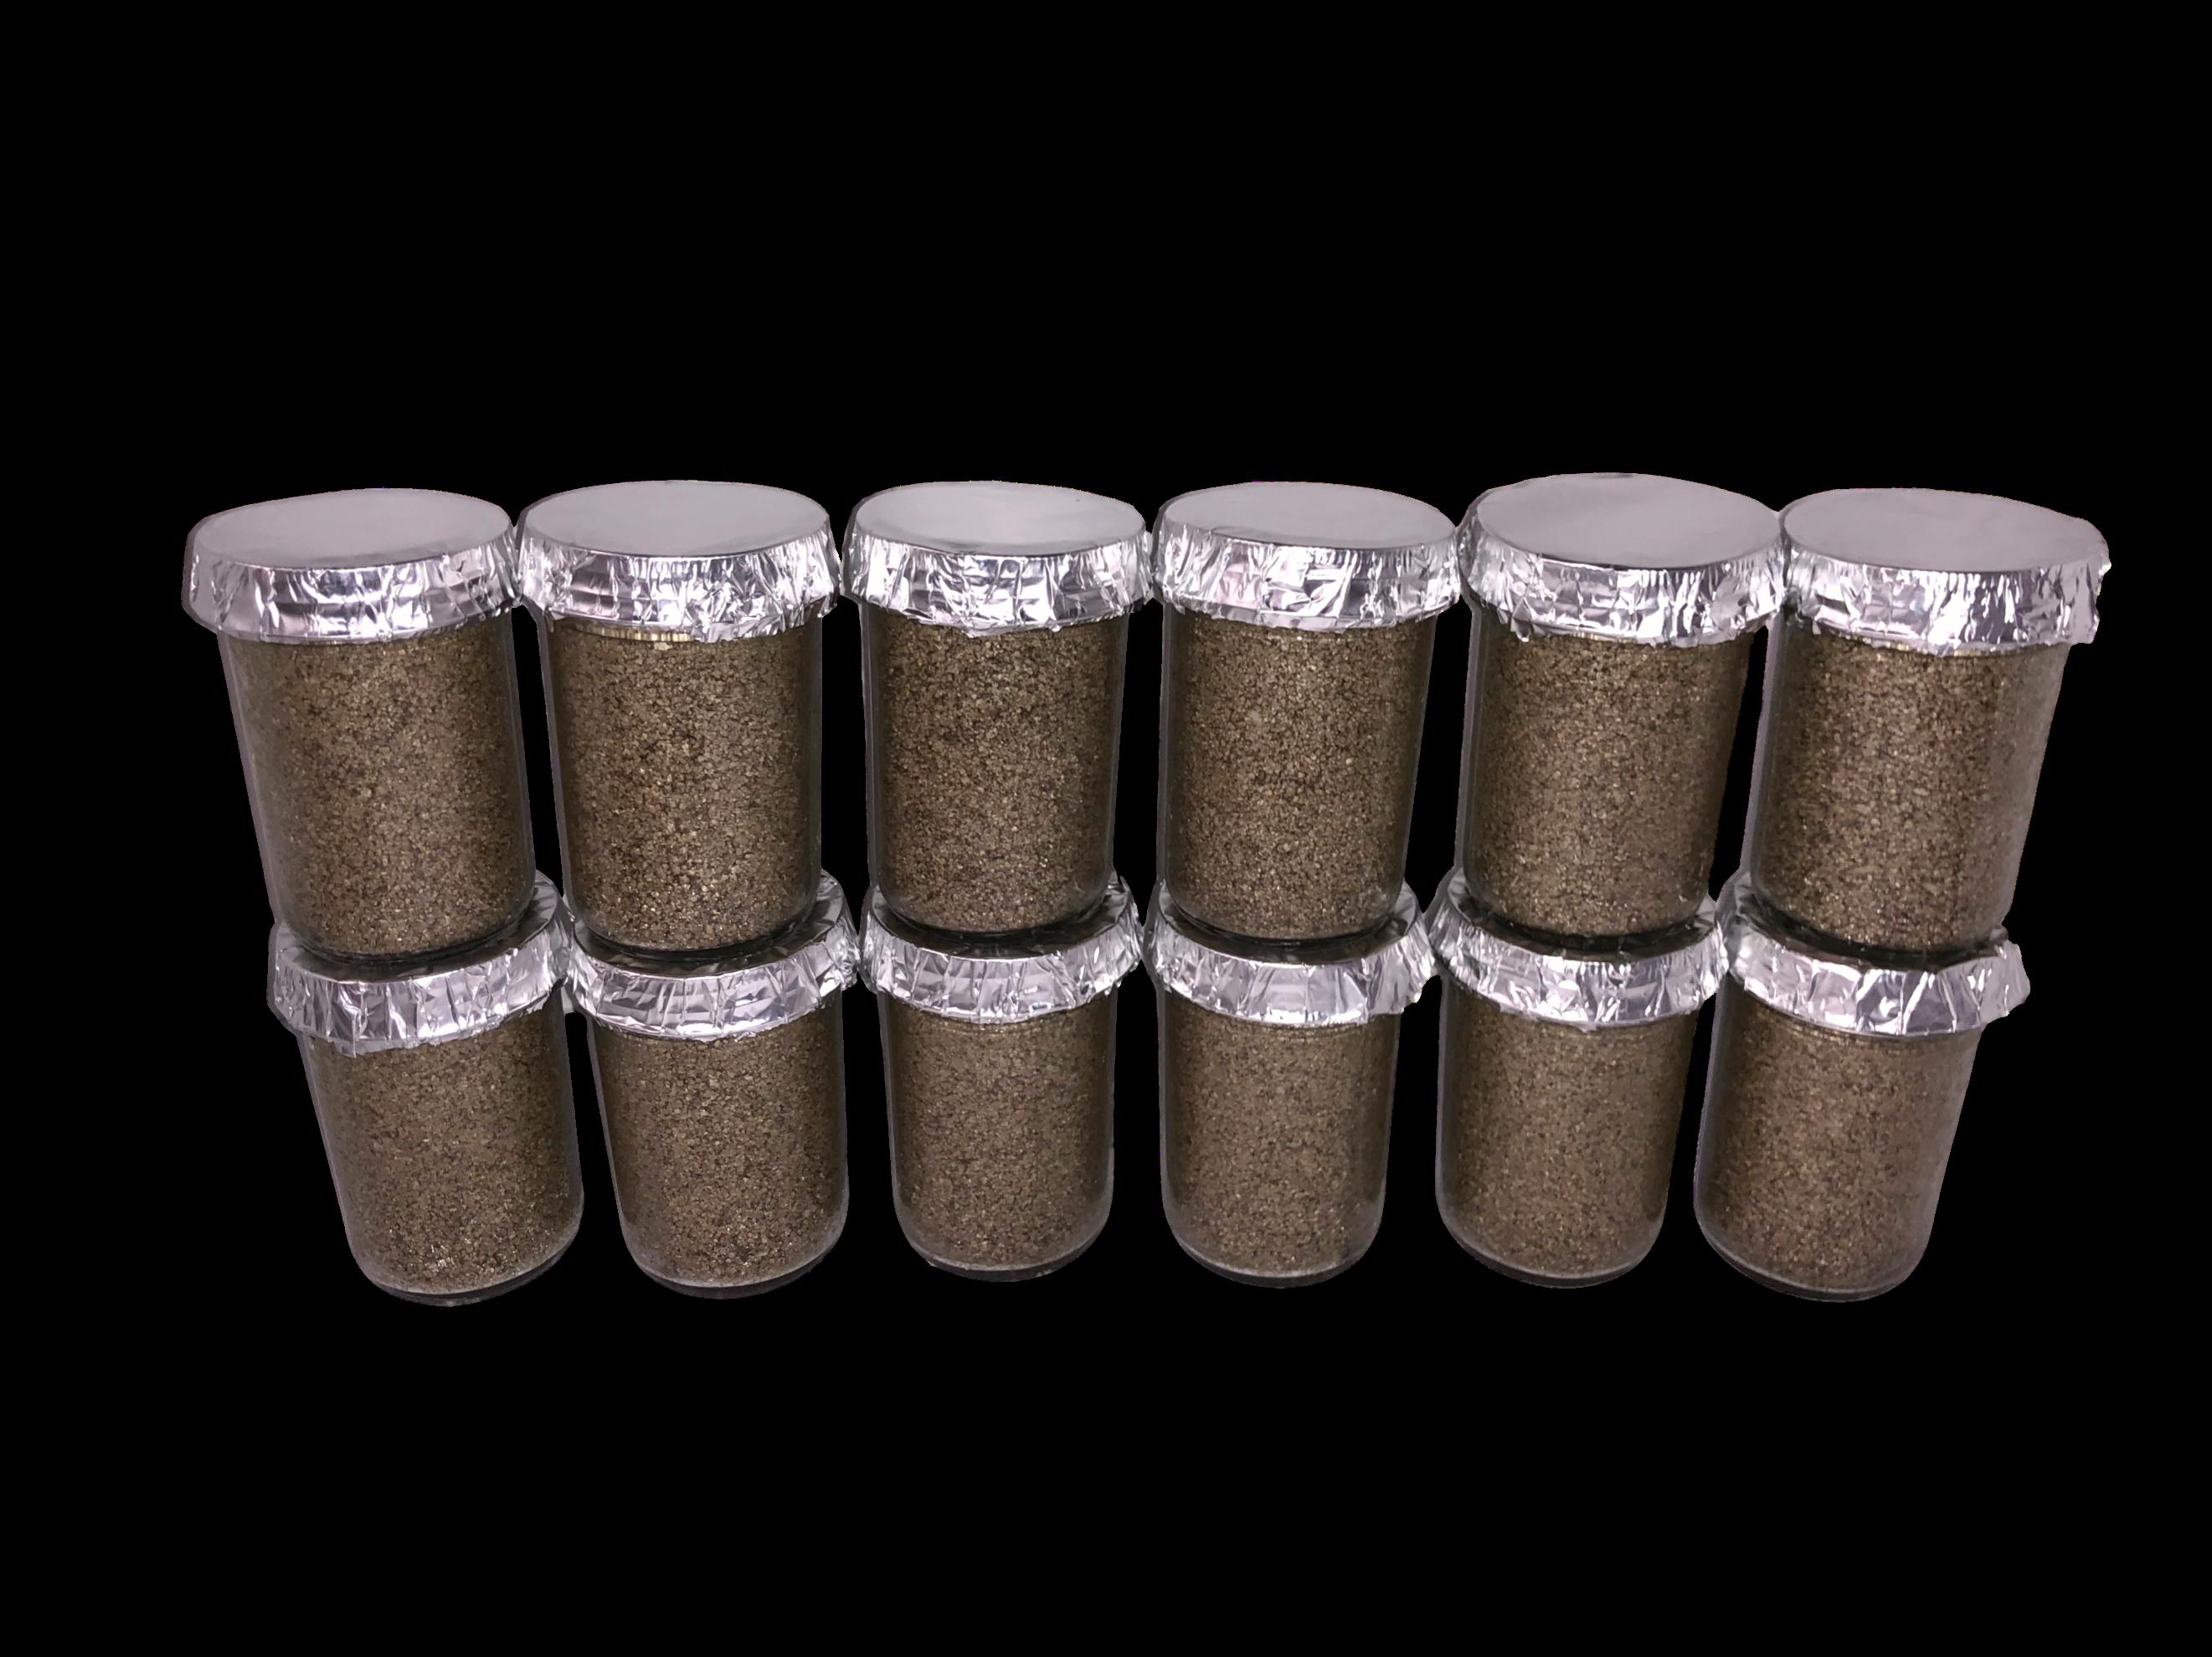 Ultimate Substrate Jars